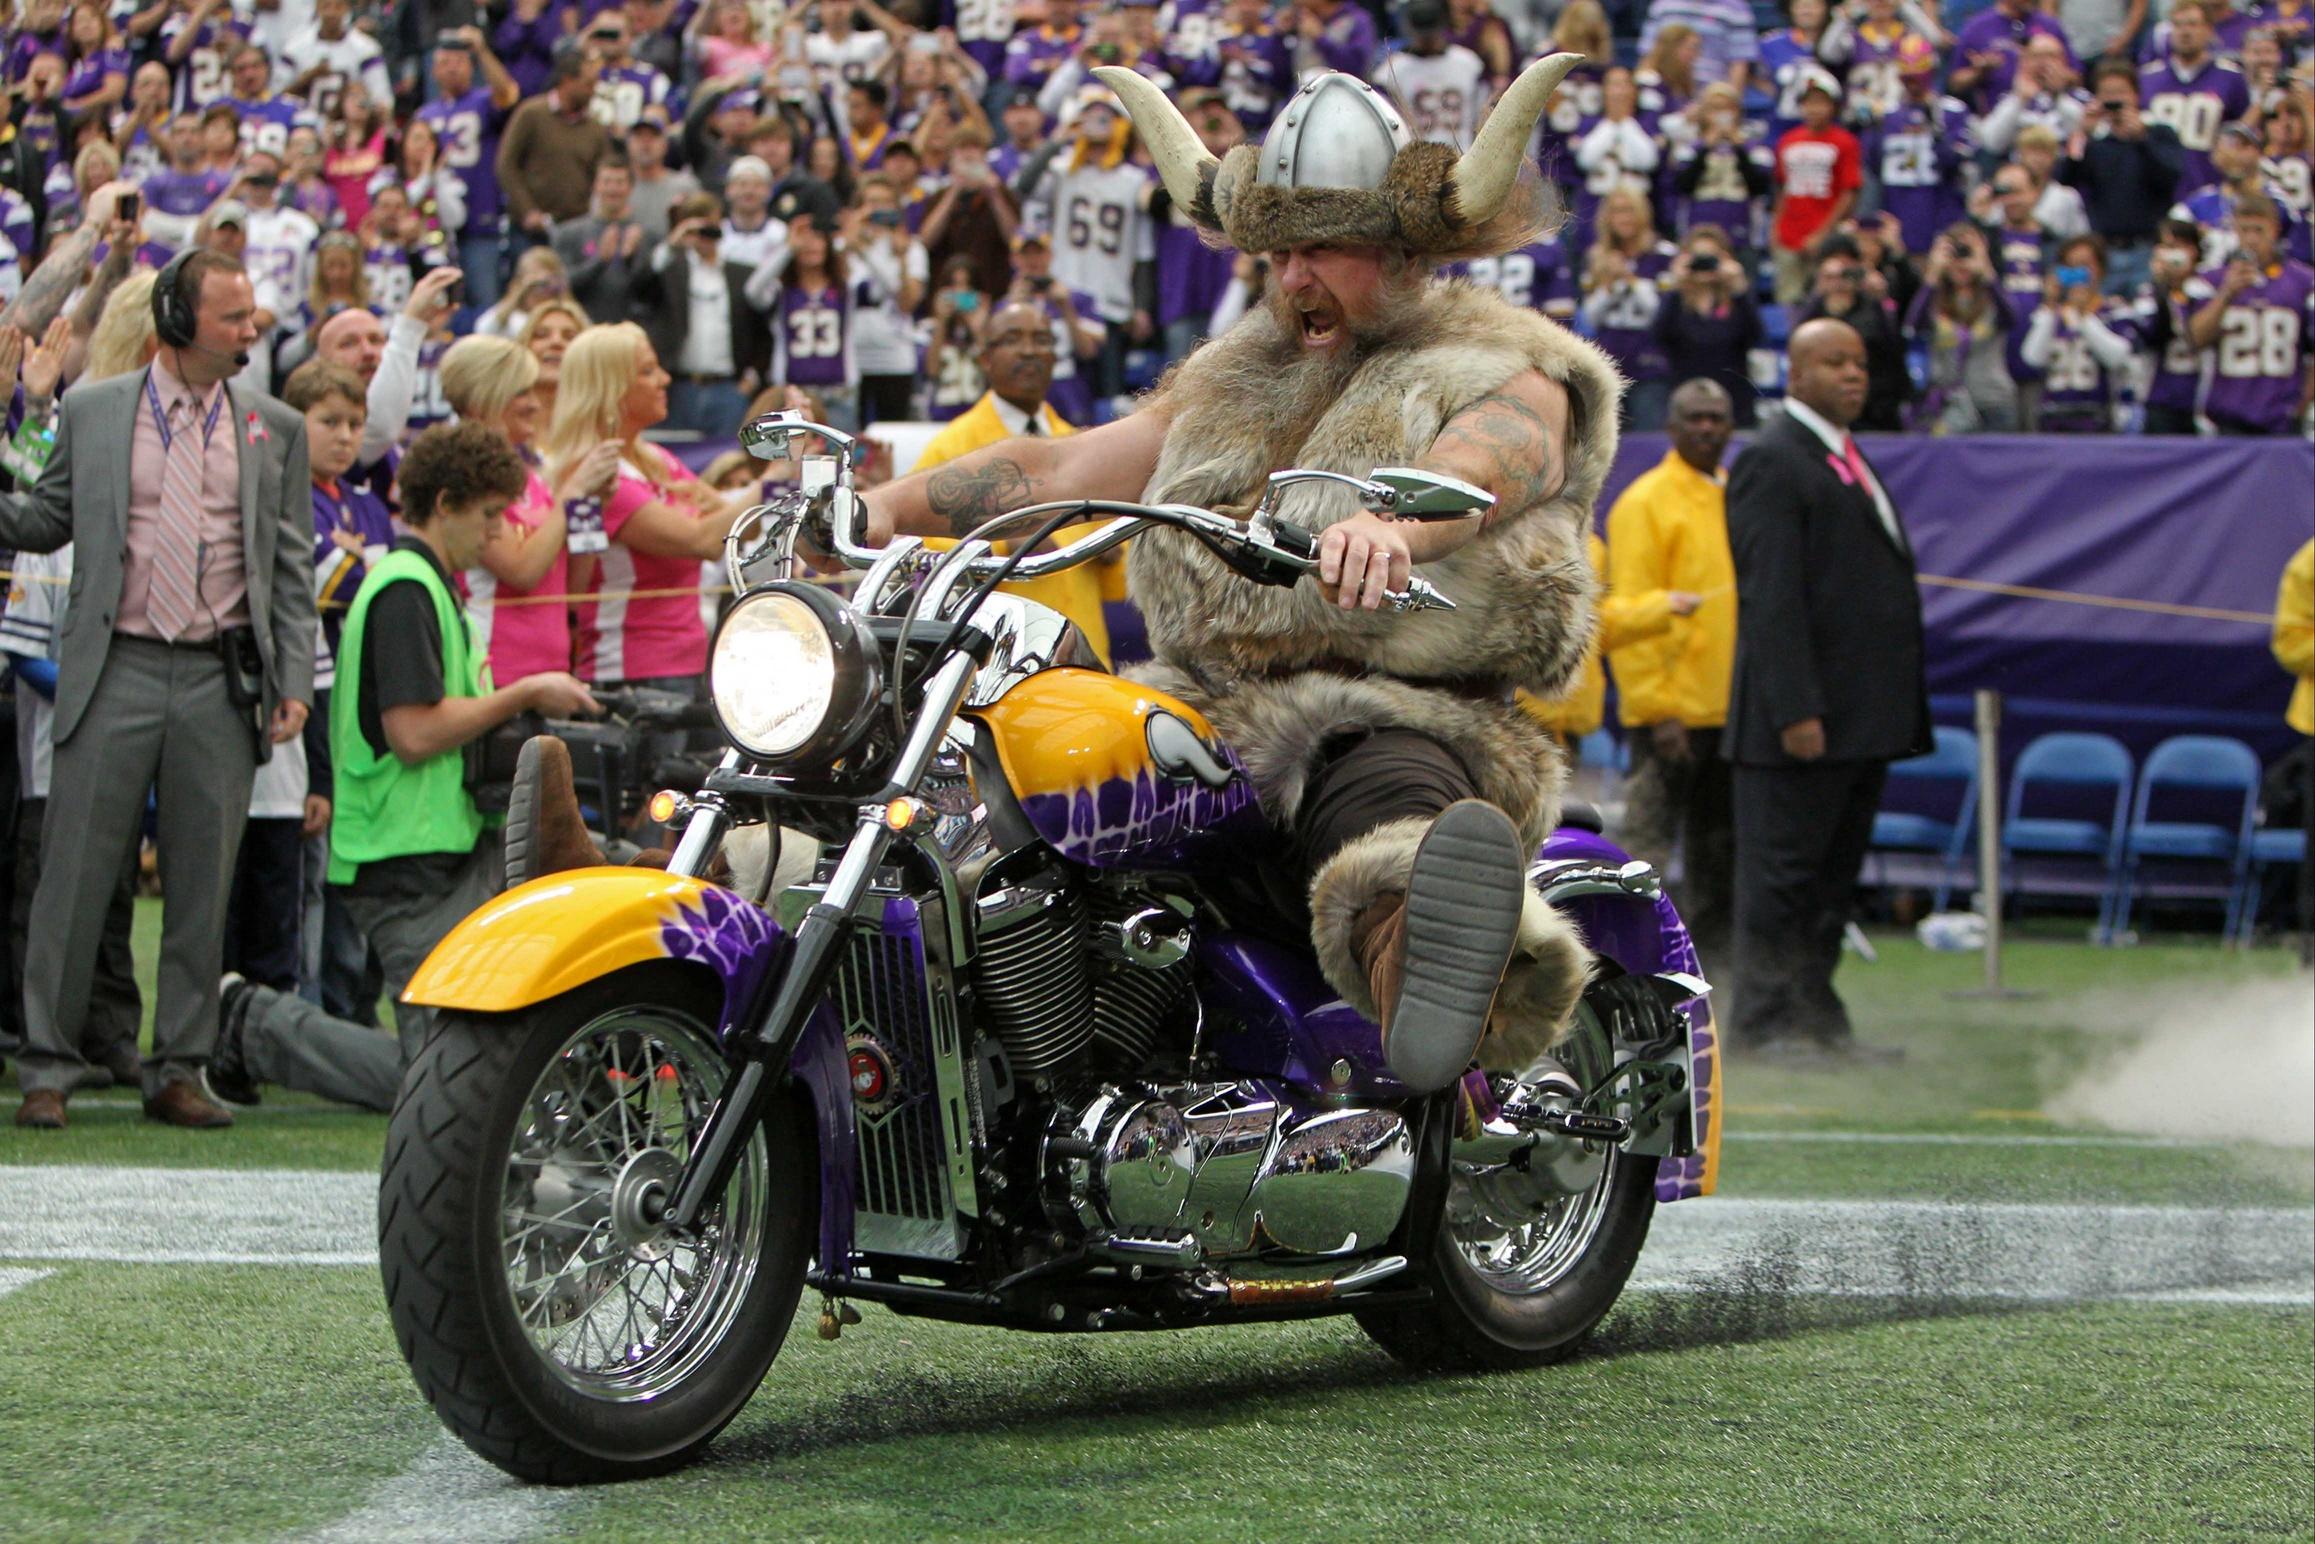 Minnesota Vikings Cut Ties With Mascot Ragnar After 20